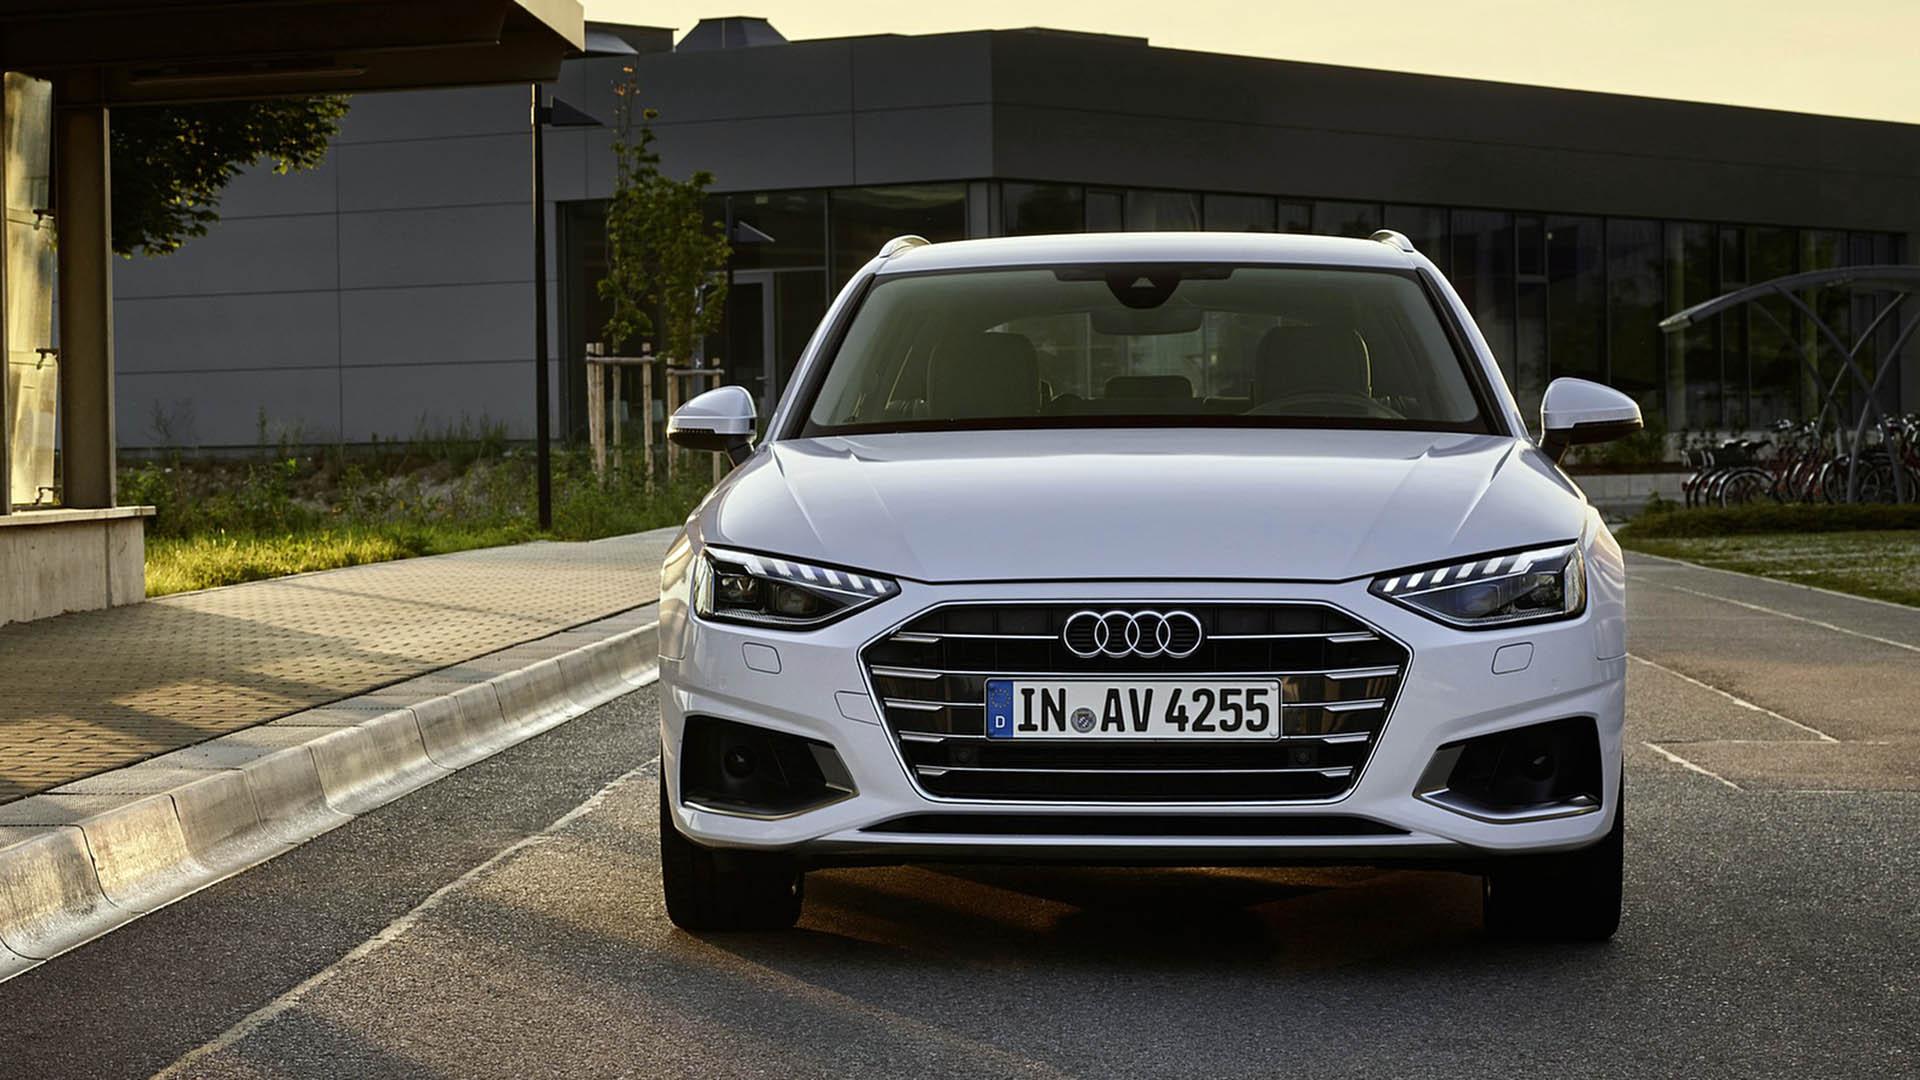 Audi: Με συμβατικούς και ηλεκτρικούς κινητήρες η νέα γενιά A4